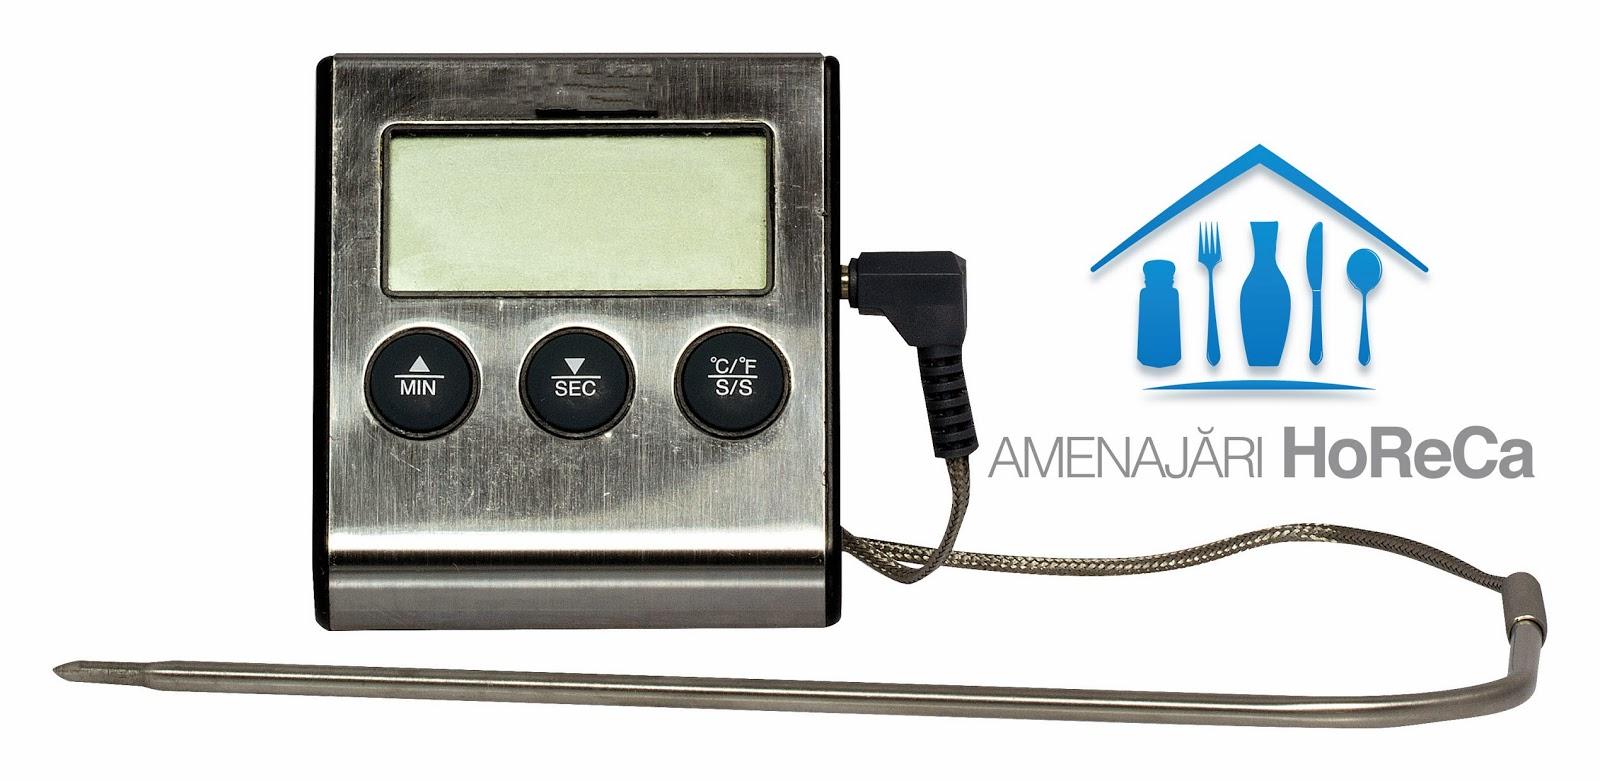 Termometru bucatarie, termometru cu sonda, Termometru timer, cronometru